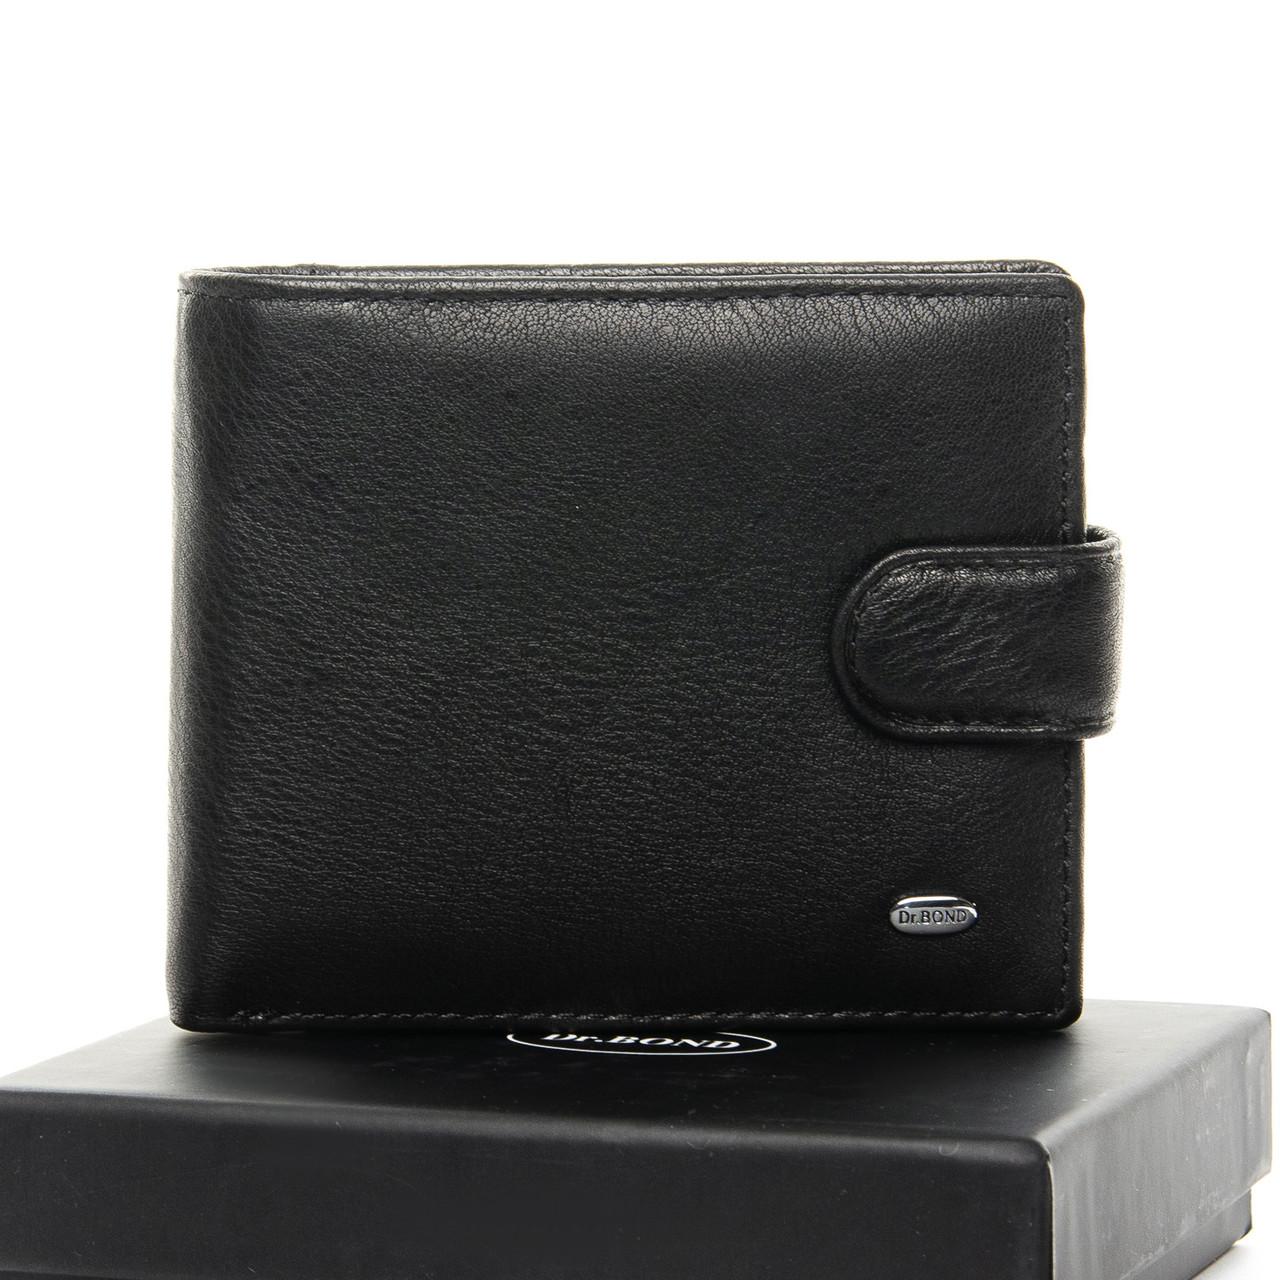 Кошелек Classic кожа DR. BOND M59-1 black